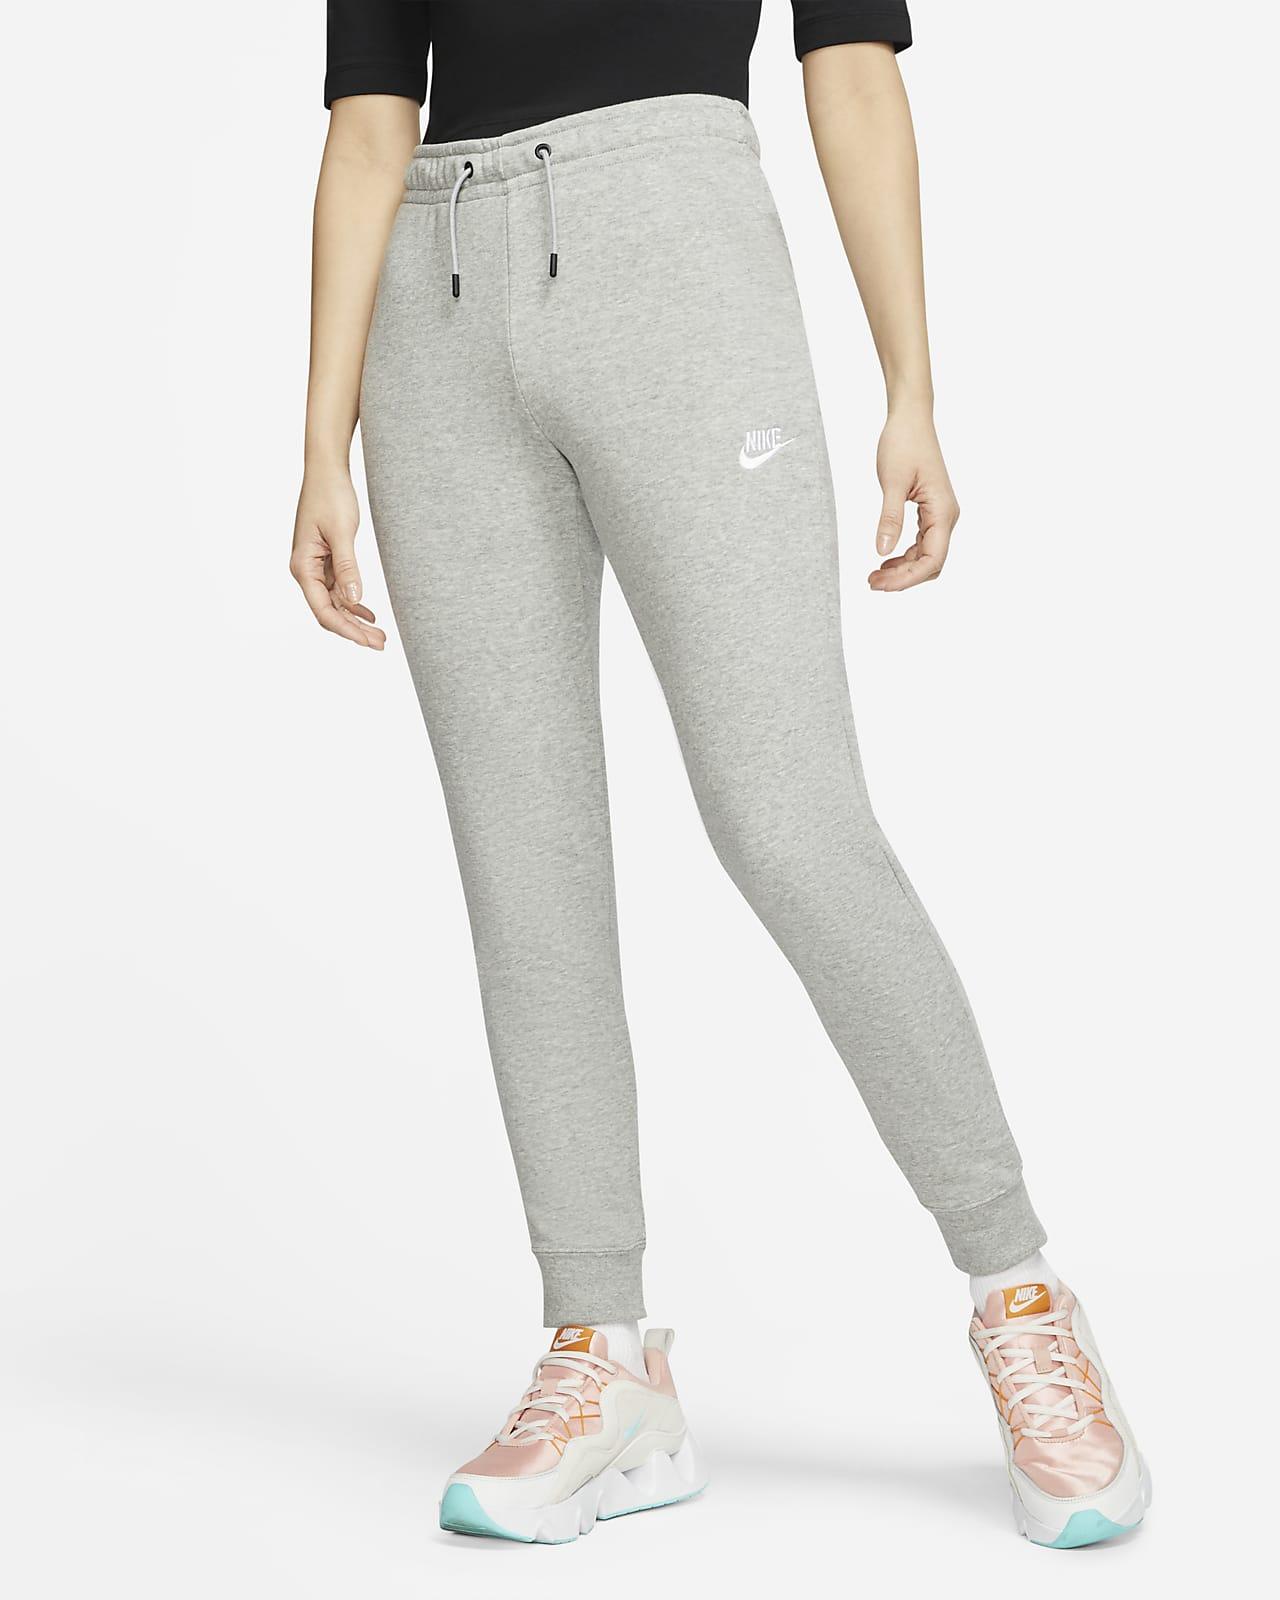 Pantalones de tejido Fleece de tiro medio para mujer Nike Sportswear Essential